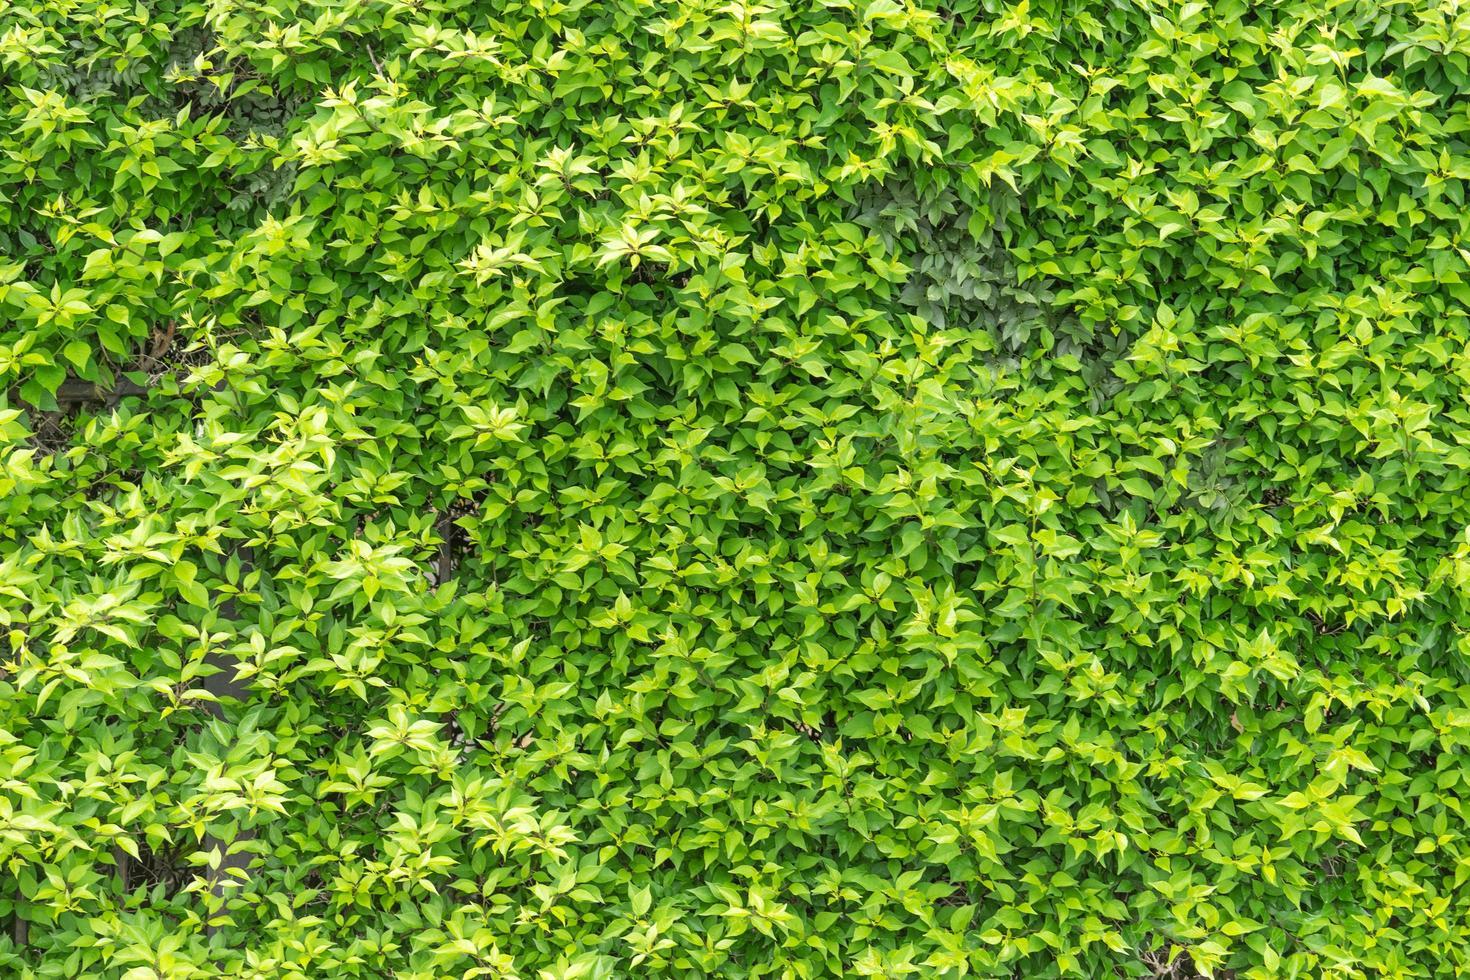 sfondo naturale di foglie verdi foto